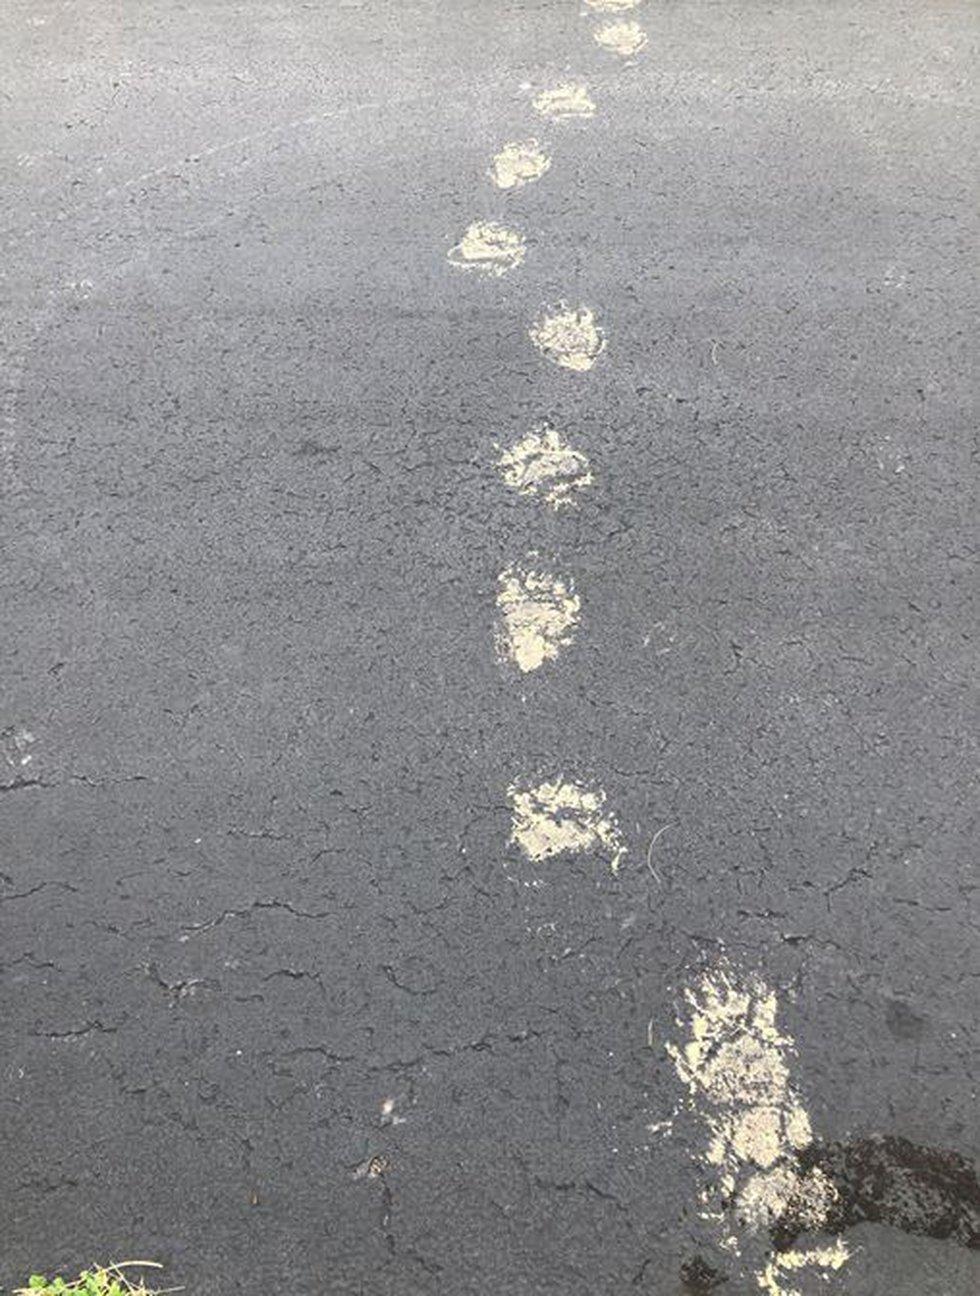 Bear tracks in Henderson